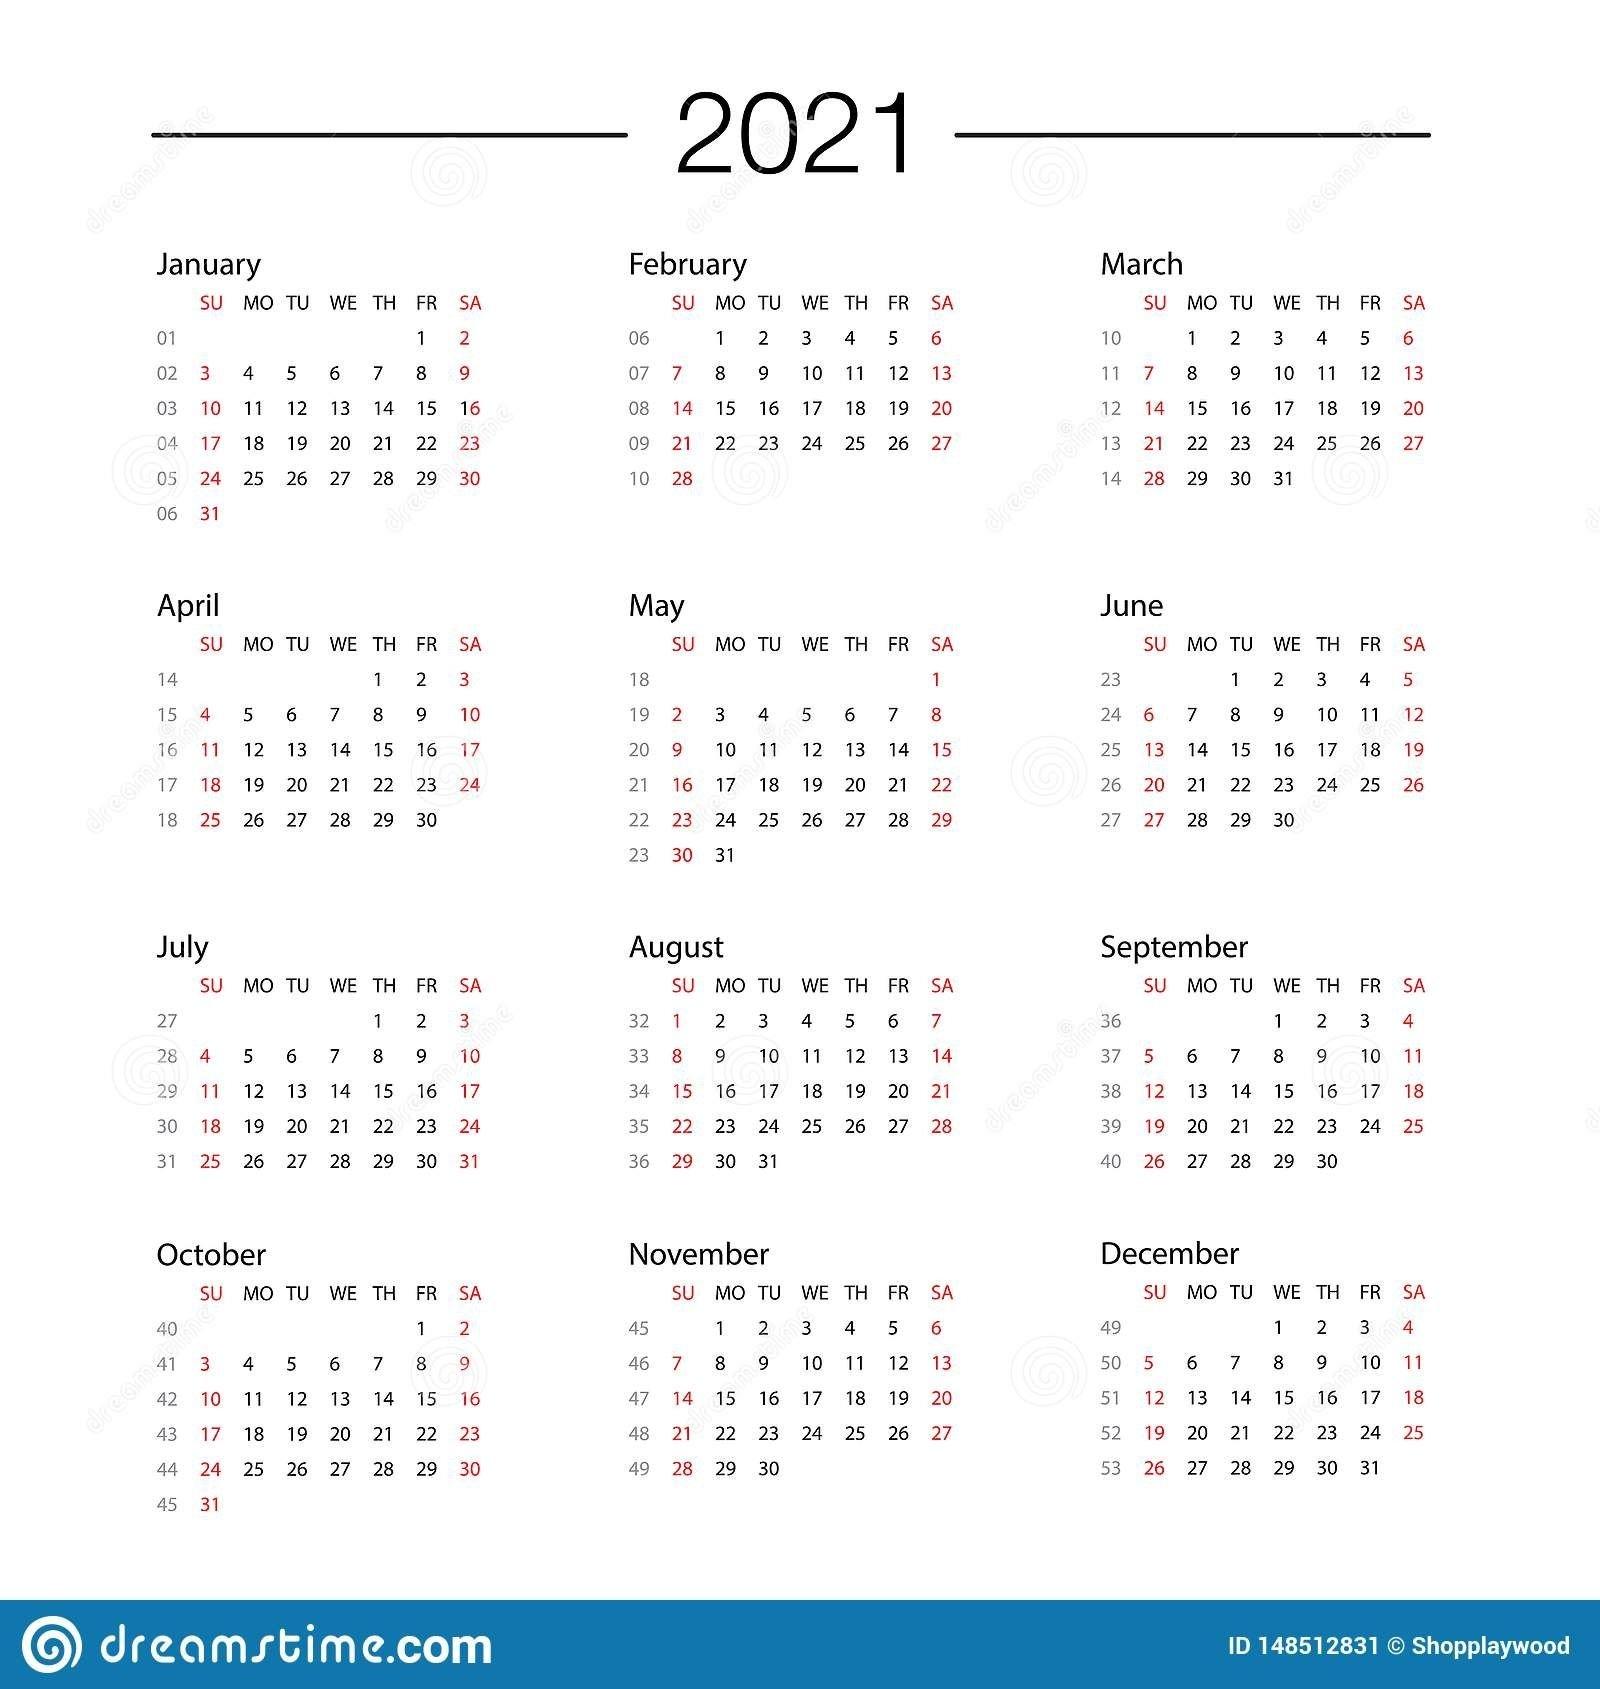 Free 8 1/2 11 Dayplanner Calendar | Get Your Calendar Free Printable 8 1/2 X 11 Calendar